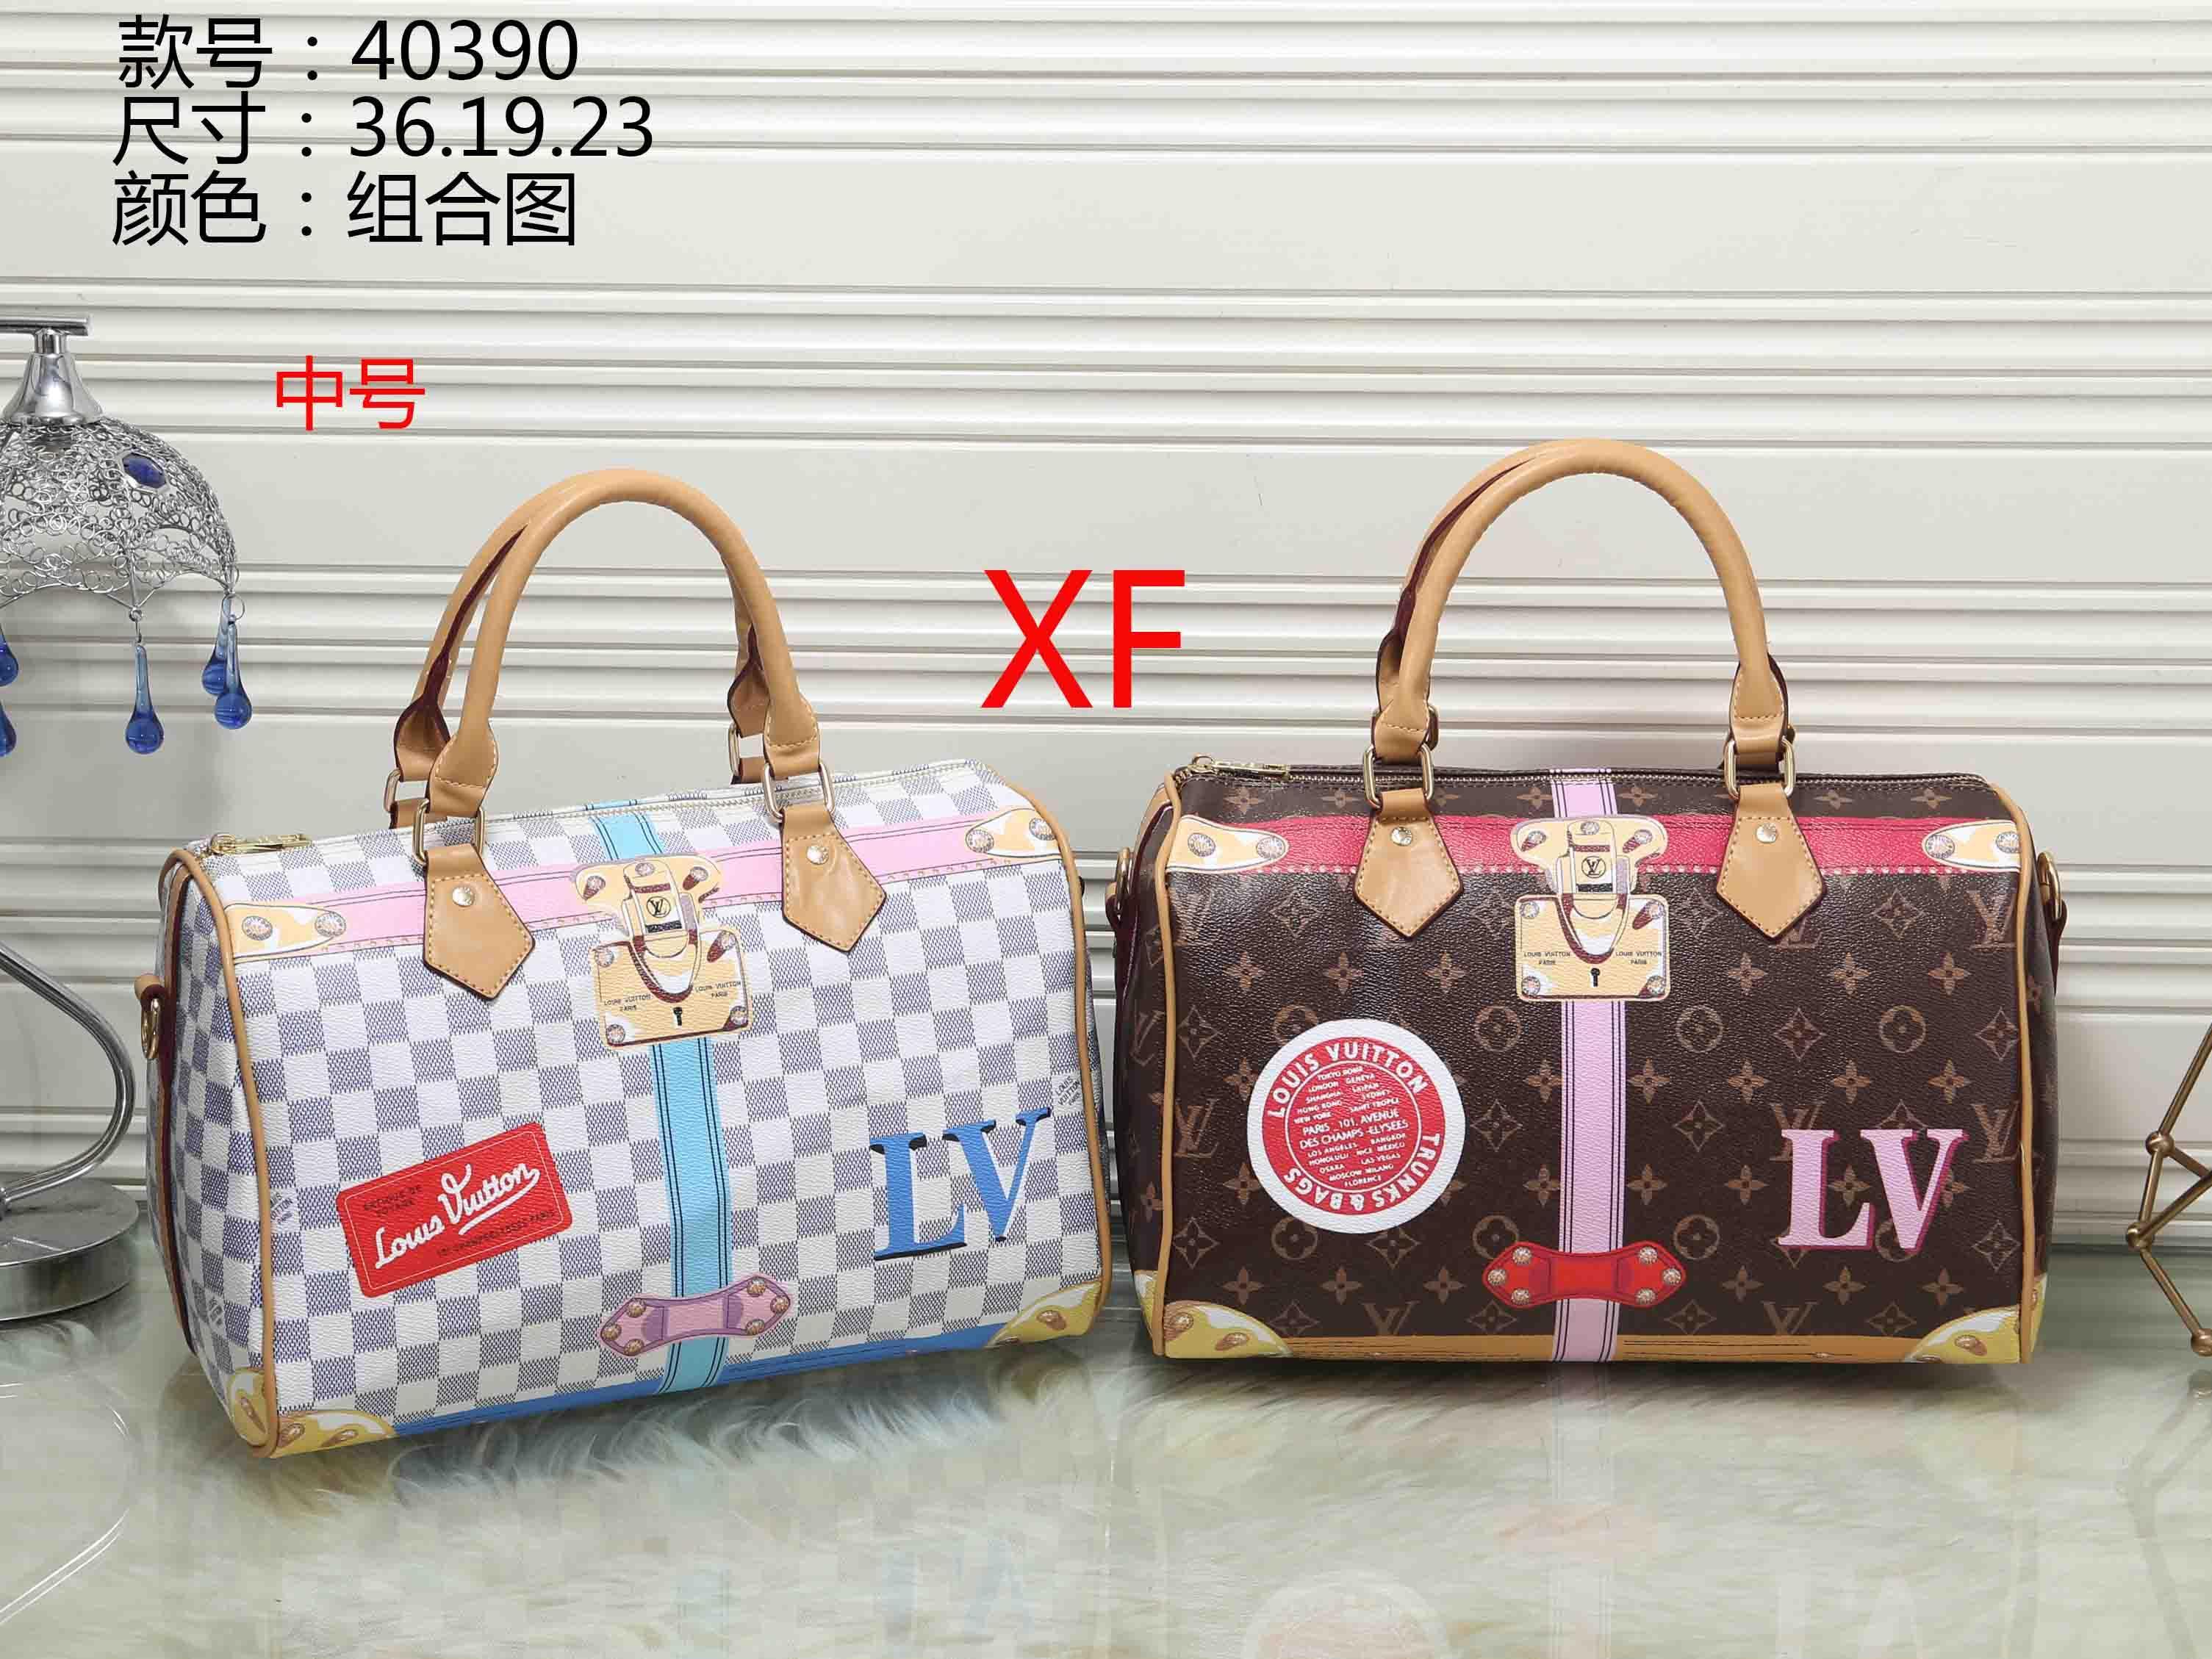 4727bb765904 LOUIS VUITTON Supreme Women Tote Bag Luxury Brand Lady Leather Handbags  Wallet Shoulder Bag Tote Clutch Women Bags Designer for Women  003 MK AJ  GUCCI LV ...